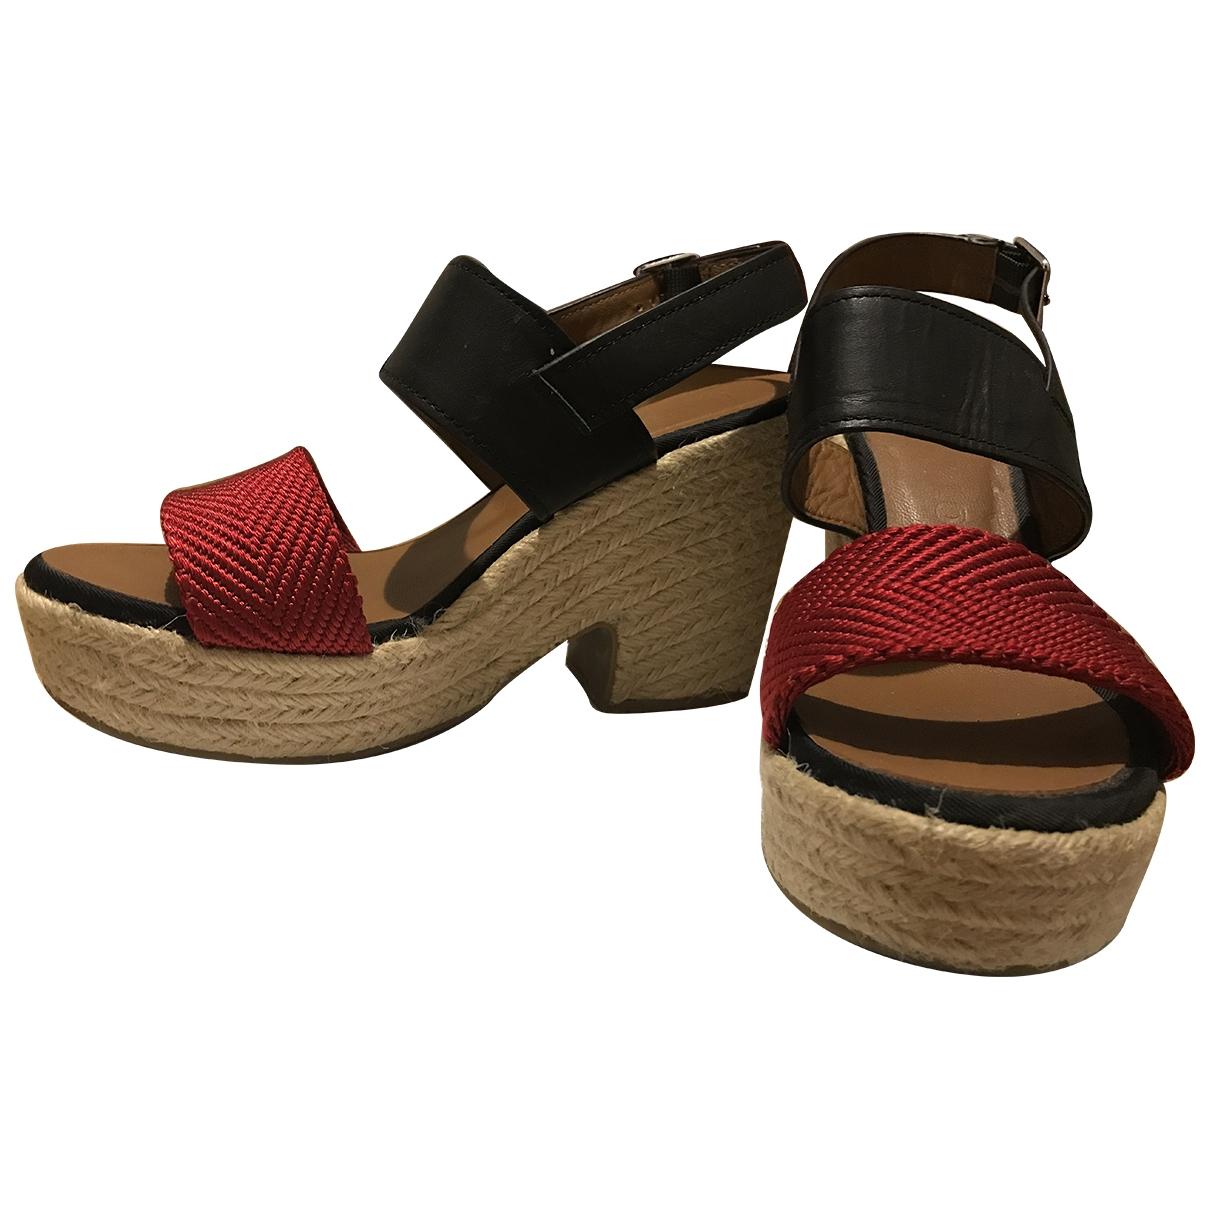 Bimba Y Lola - Sandales   pour femme en cuir - rouge